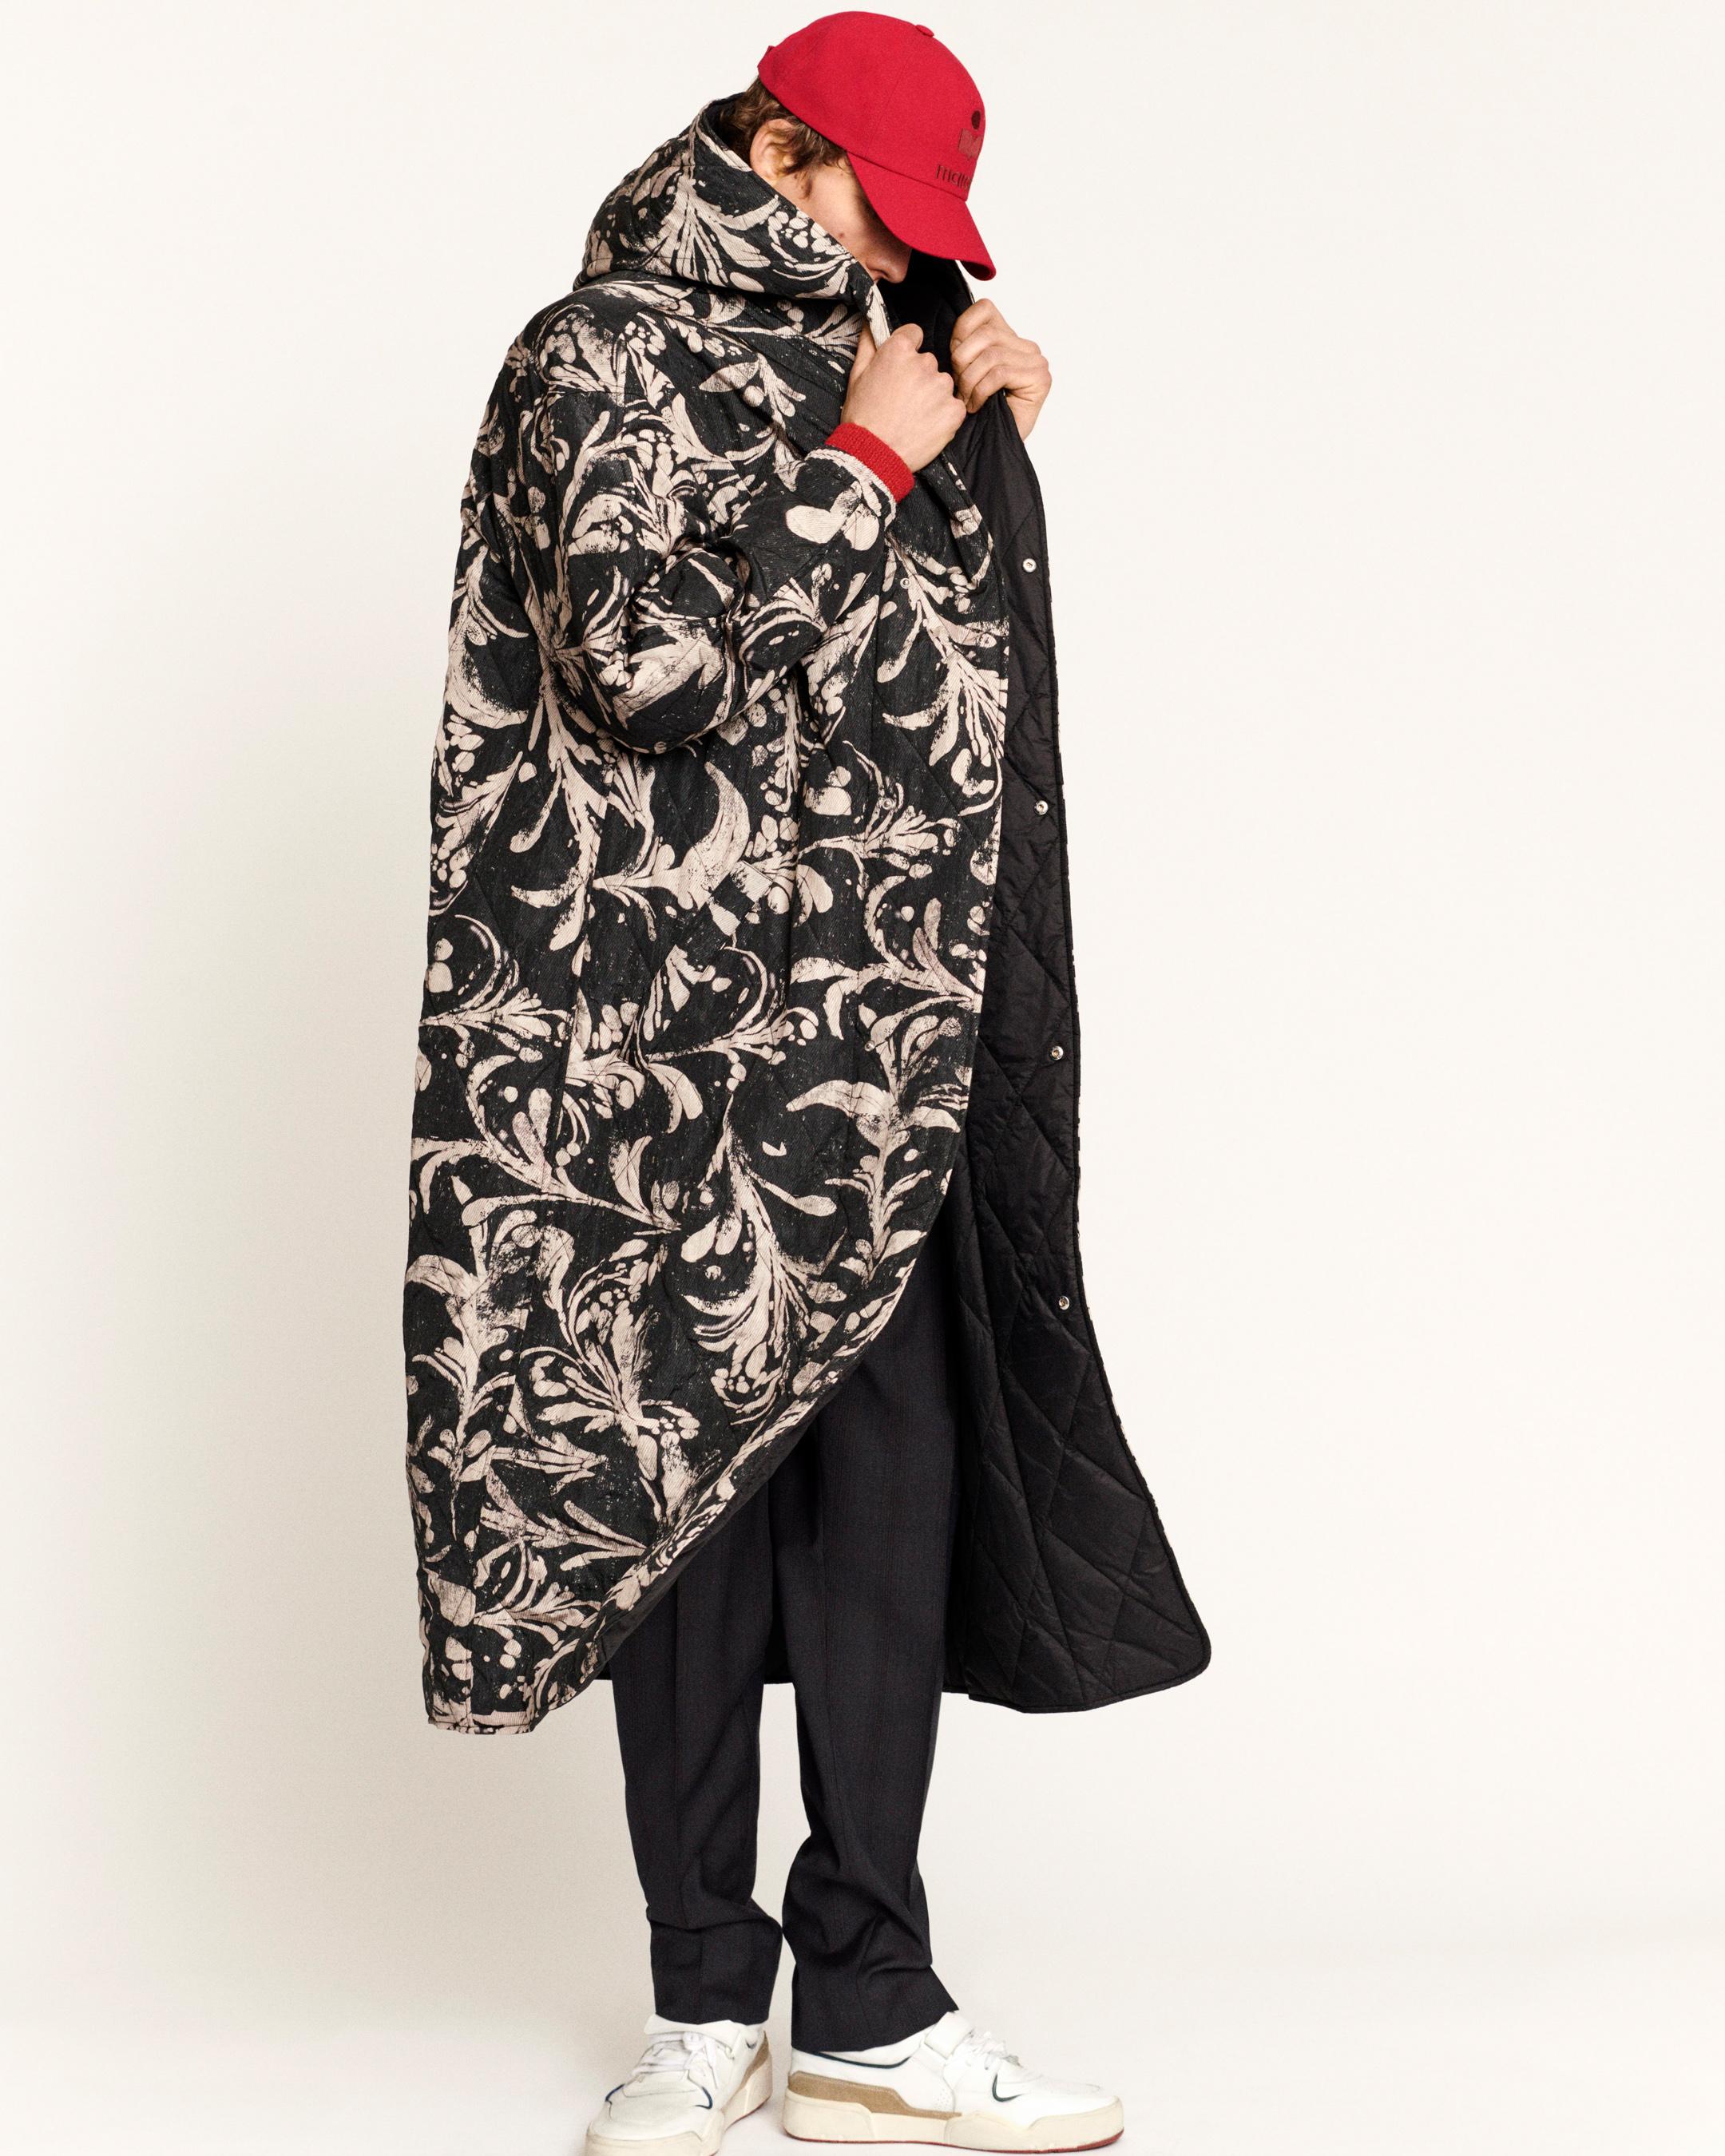 Isabel Marant Fall 2021 Men's Fashion Show Photos